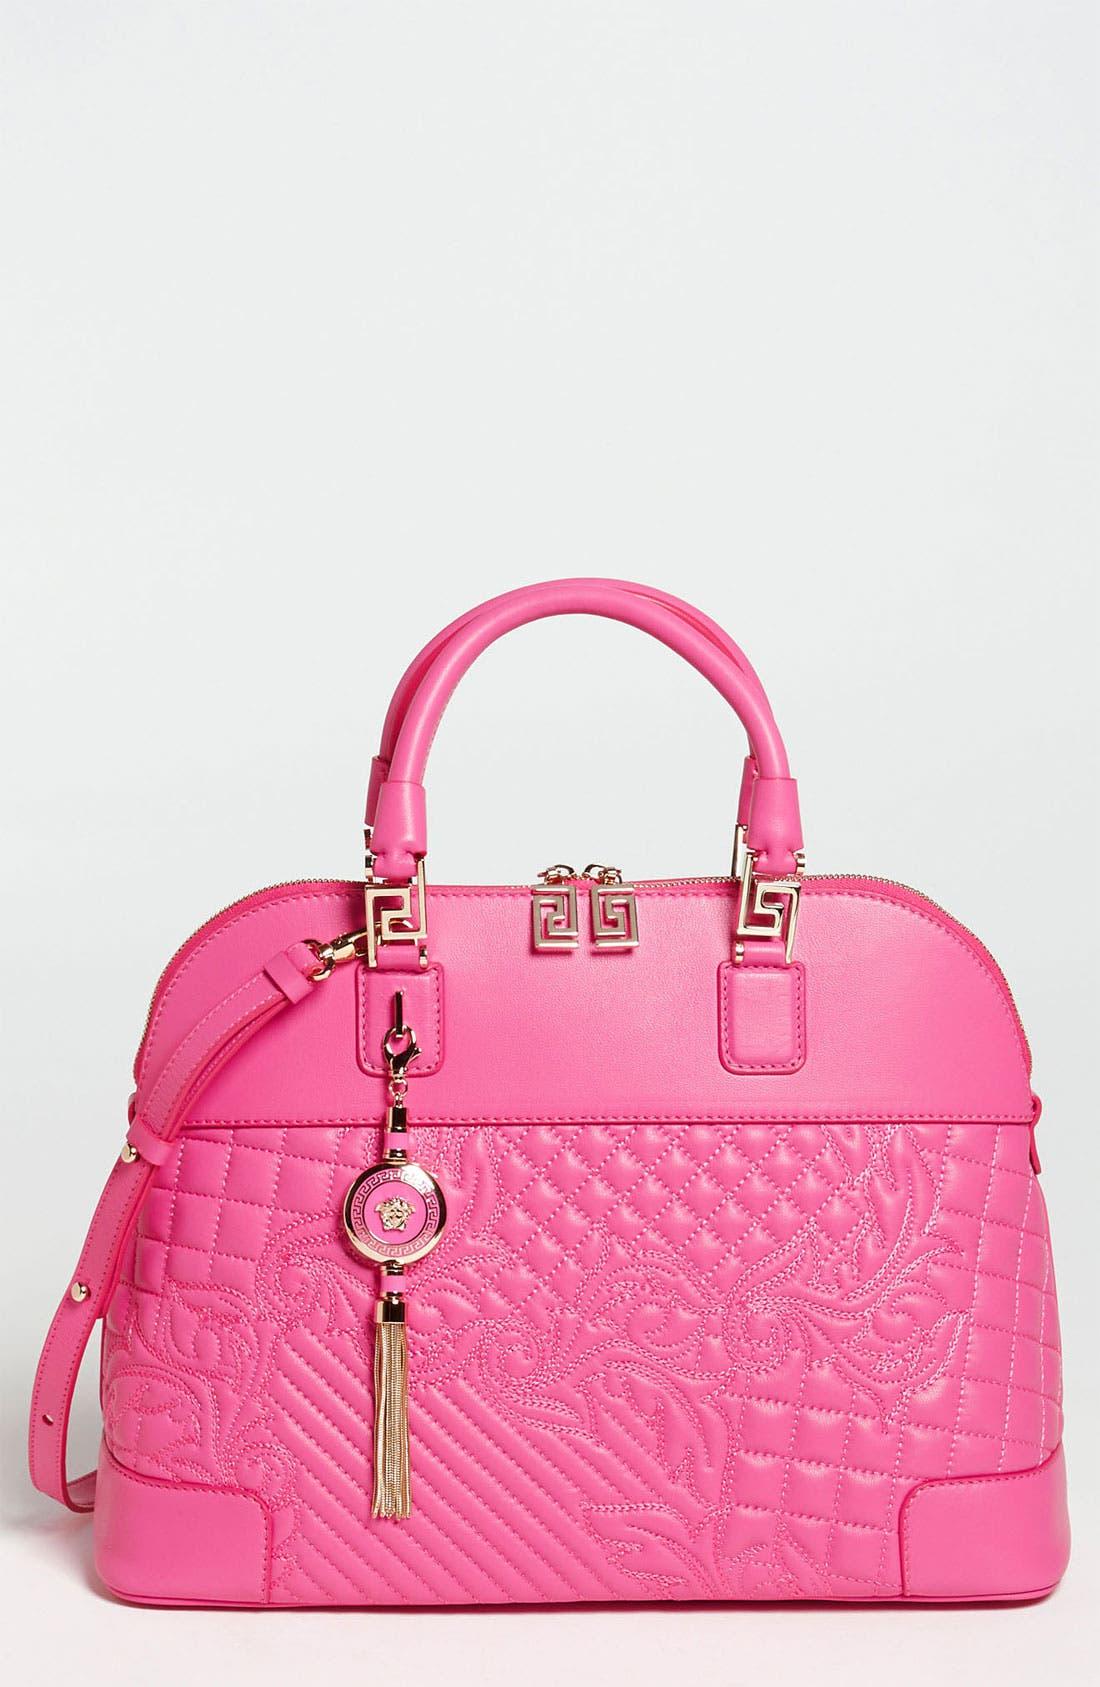 Alternate Image 1 Selected - Versace 'Vanitas' Embroidered Leather Satchel